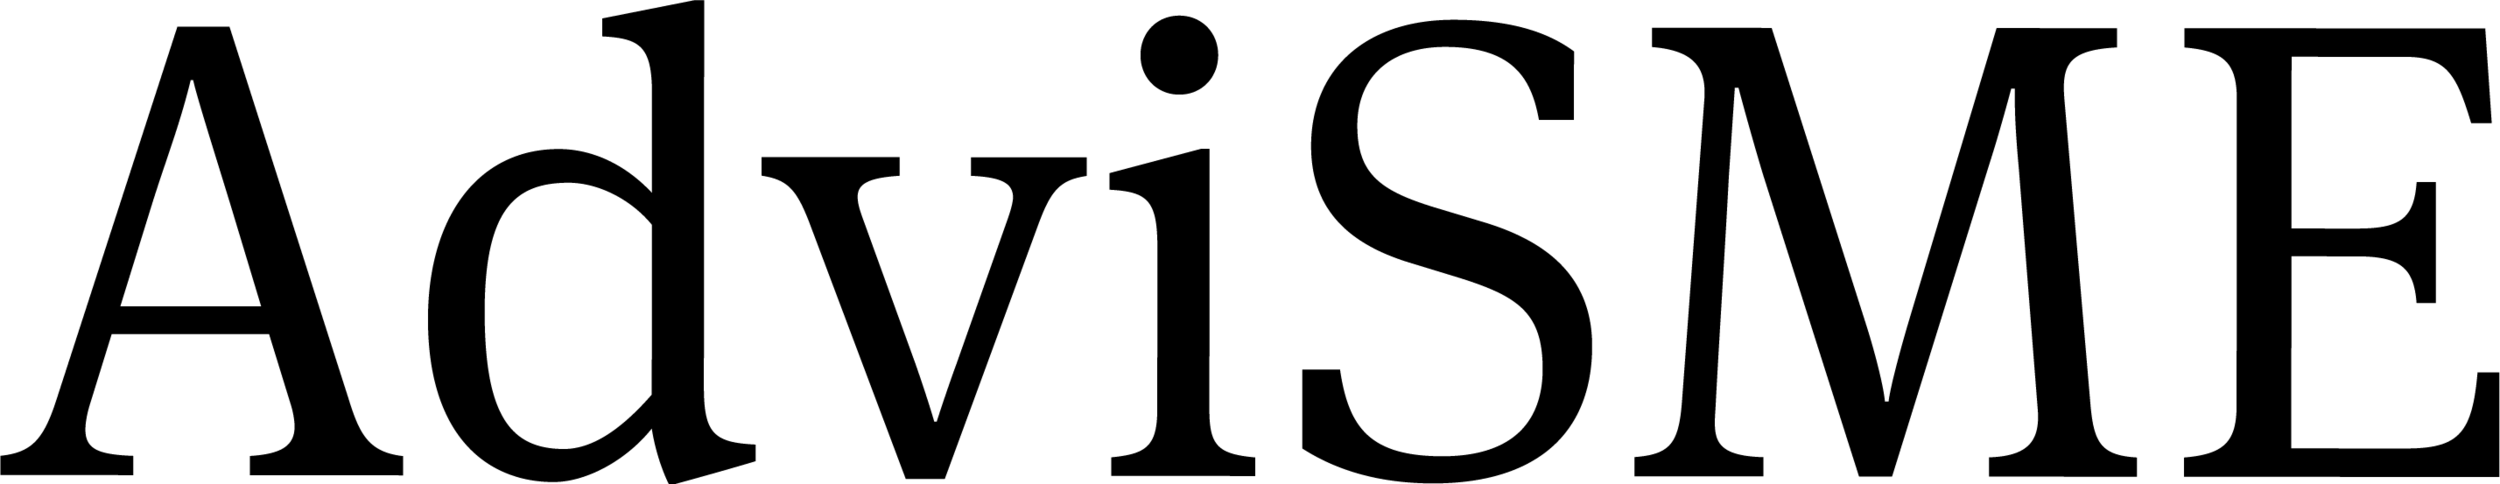 AdviSME short logo B&W.png